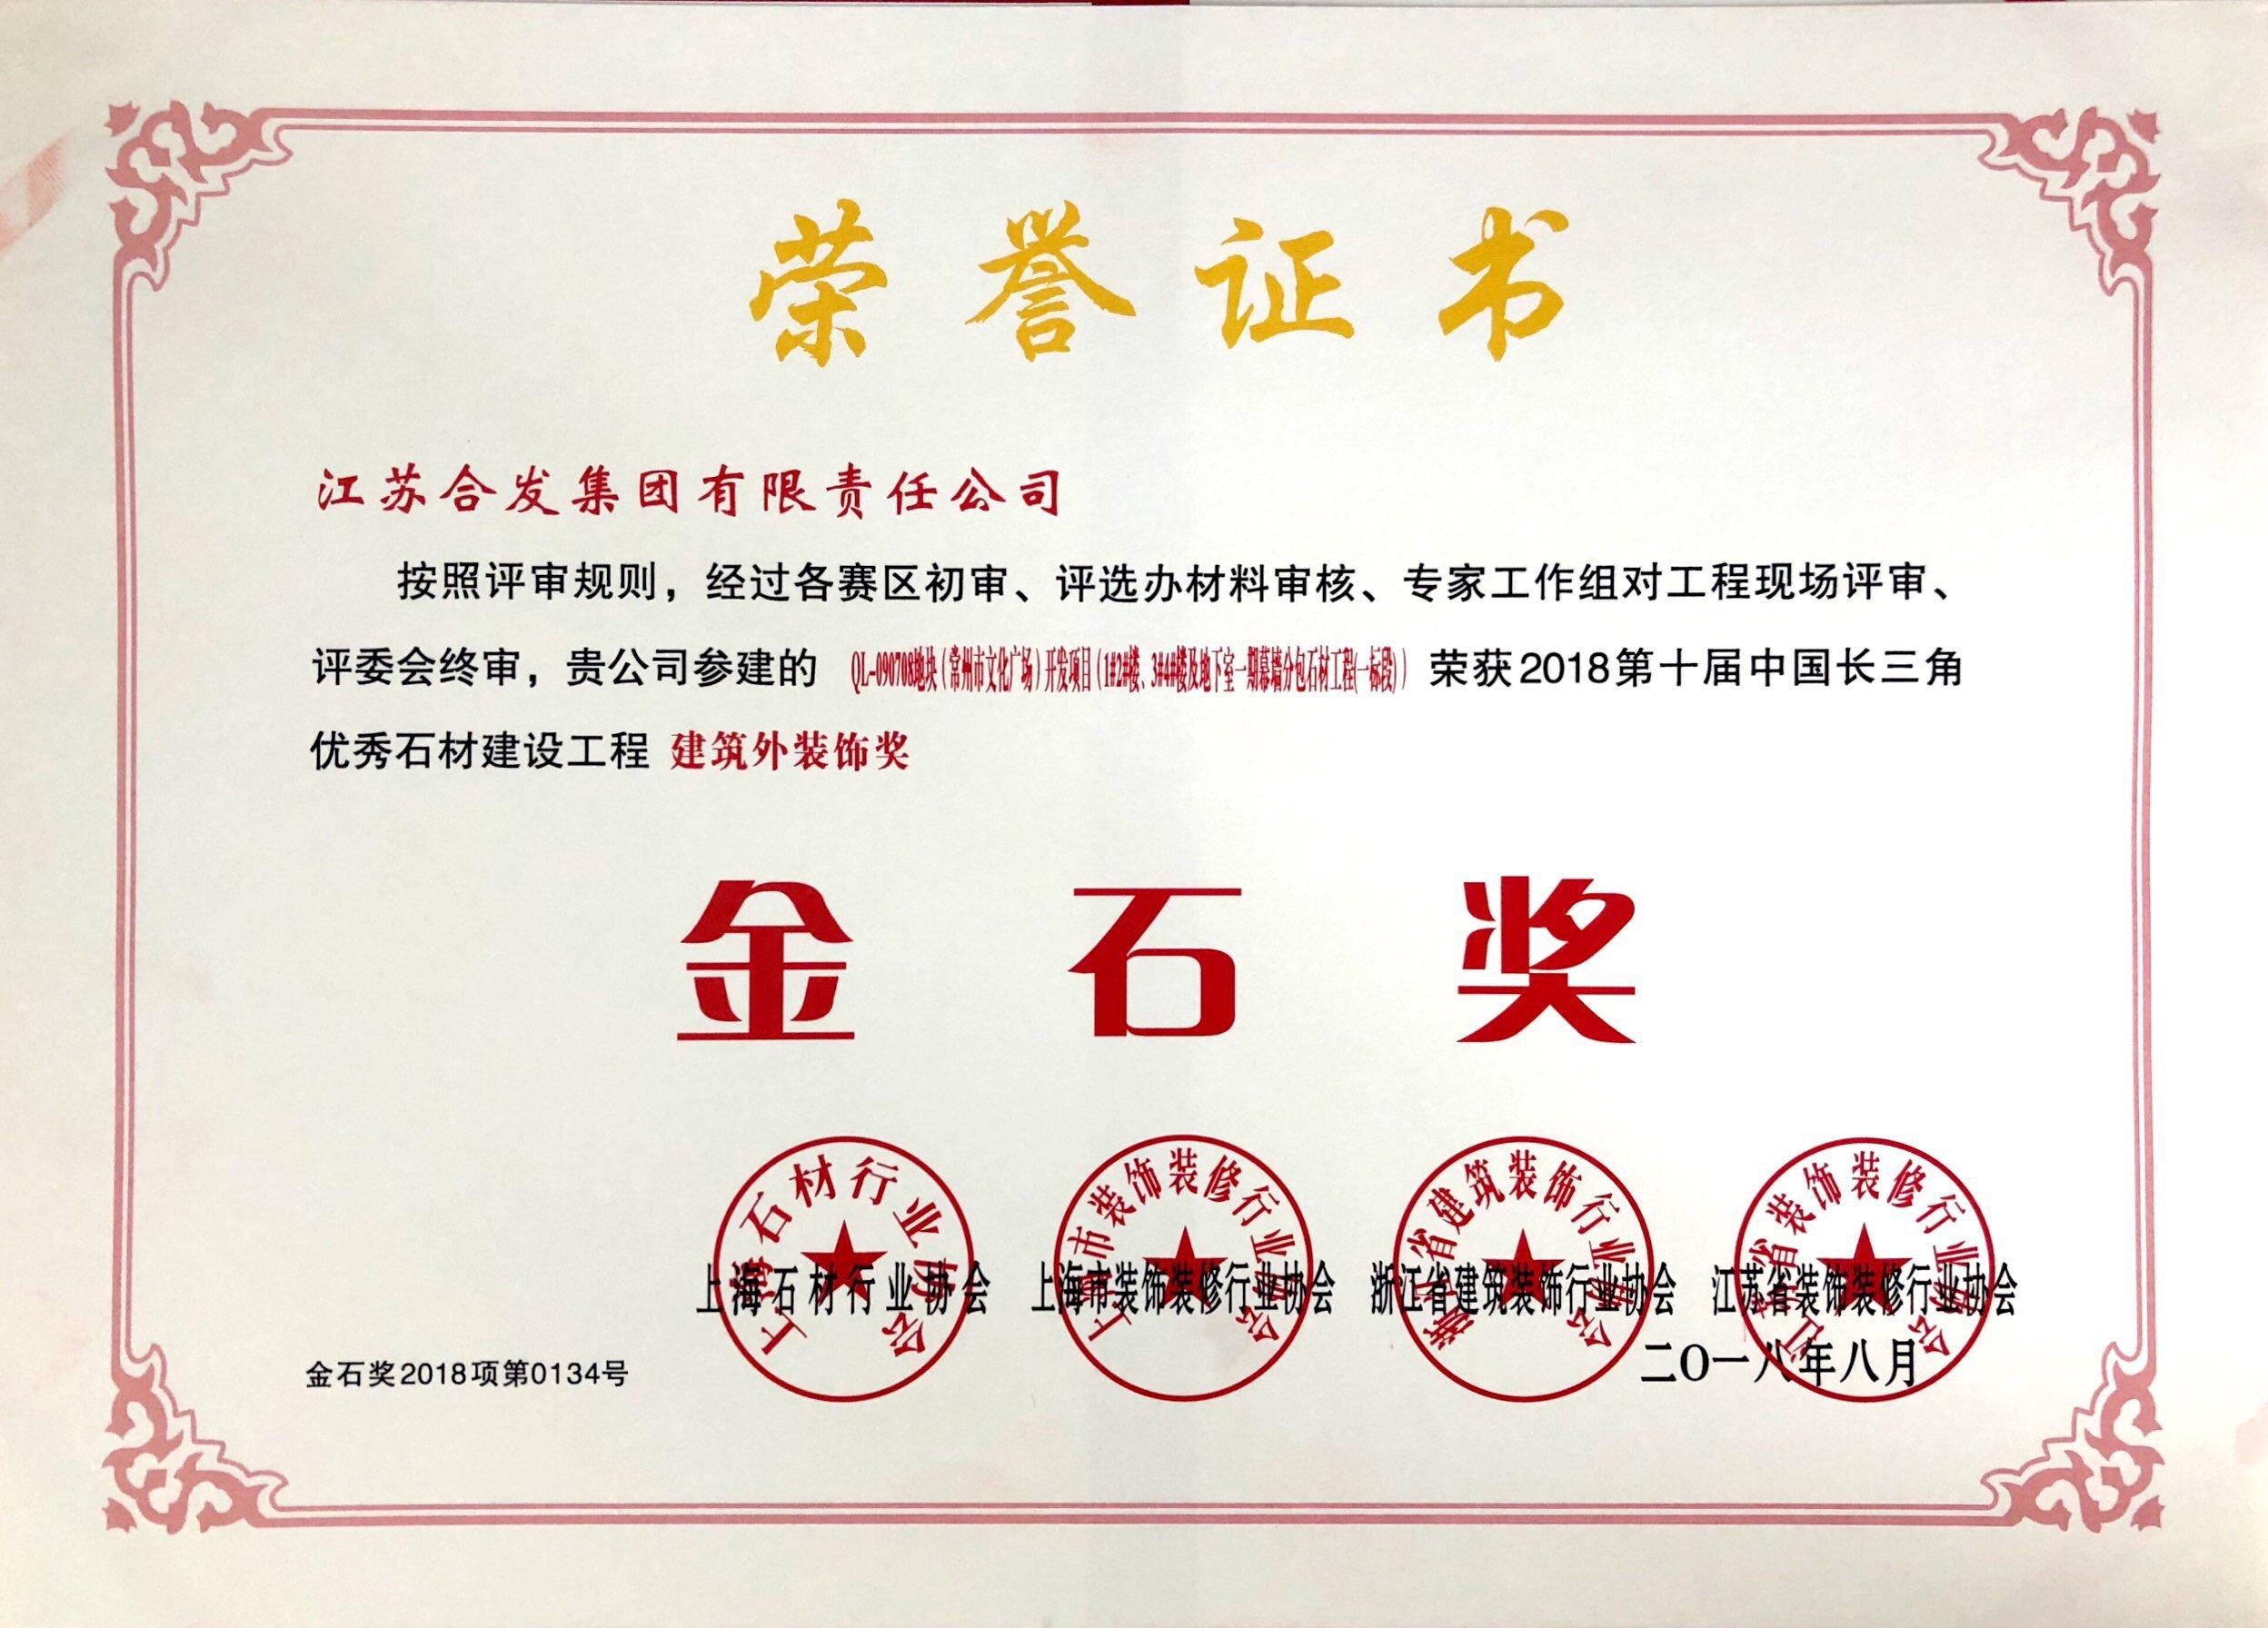 QL-090708地塊(常州市文化廣場)開發項目(1#2#樓、3#4#樓及地下室一期幕墻分包工程(一標段) )